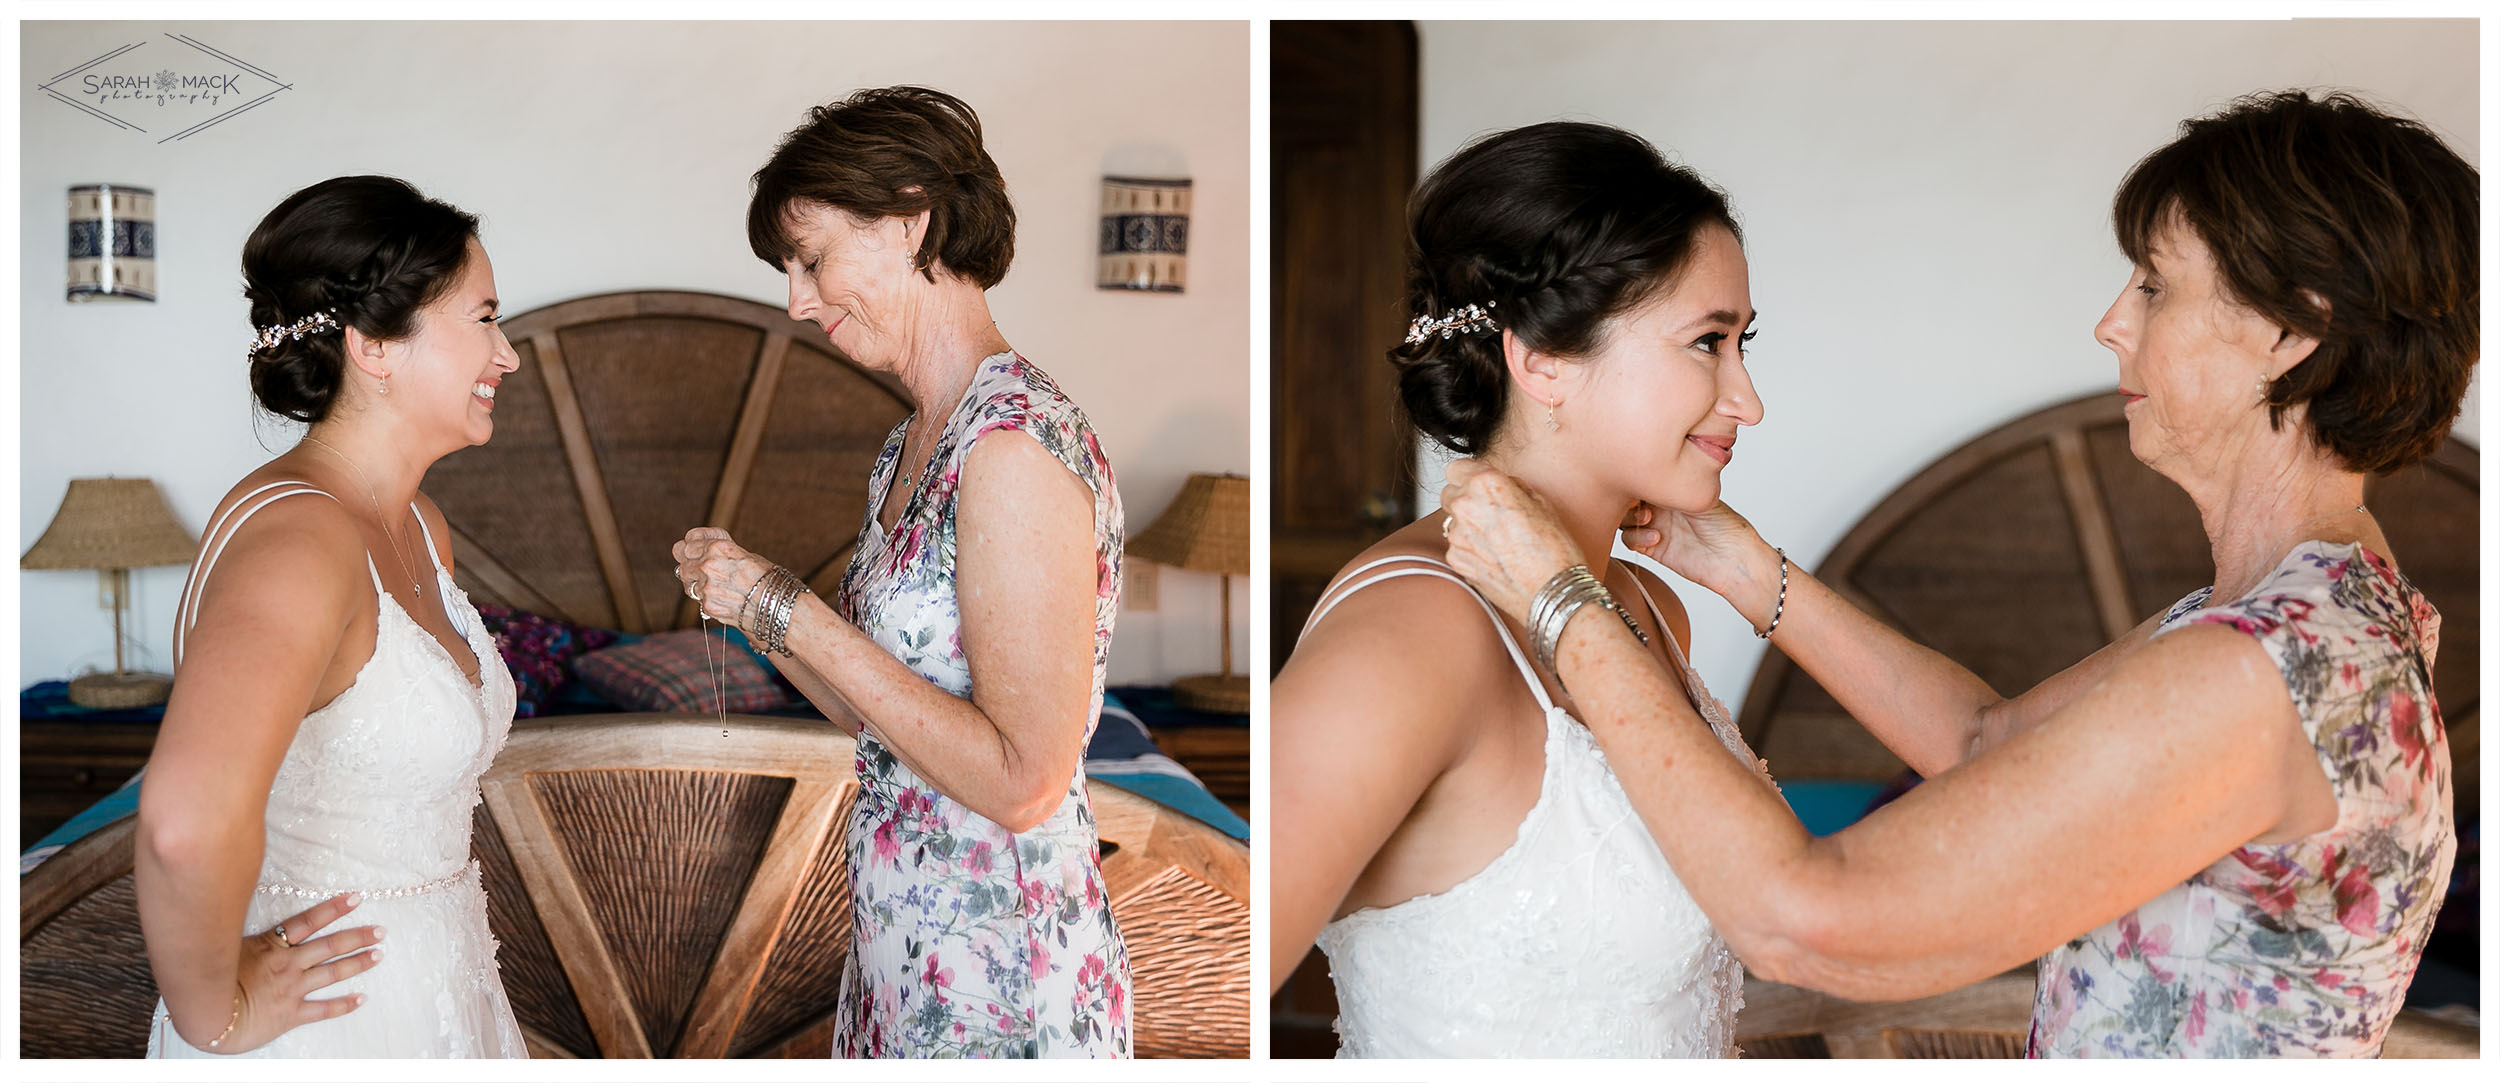 ES-Flor-de-Playa-Sayulita-Wedding-Photography-11.jpg